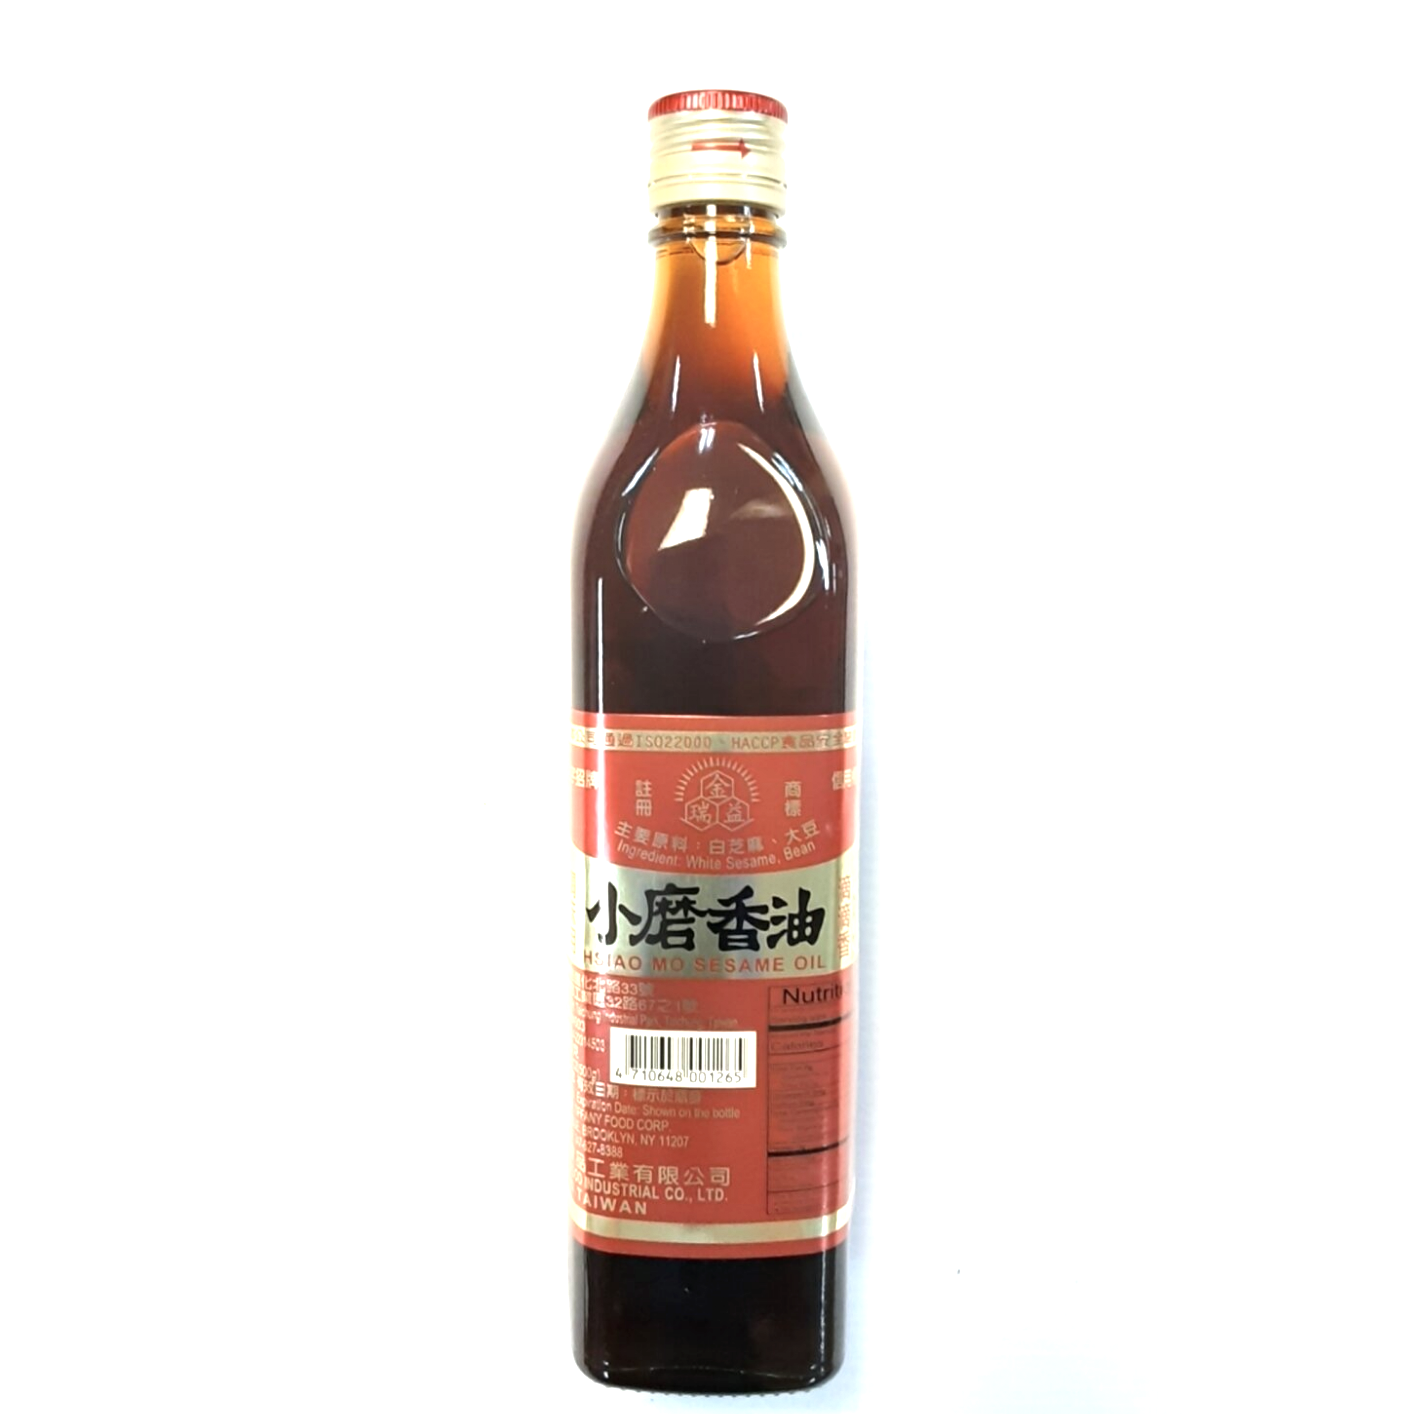 GROC【杂货】金润益调味用小磨香油